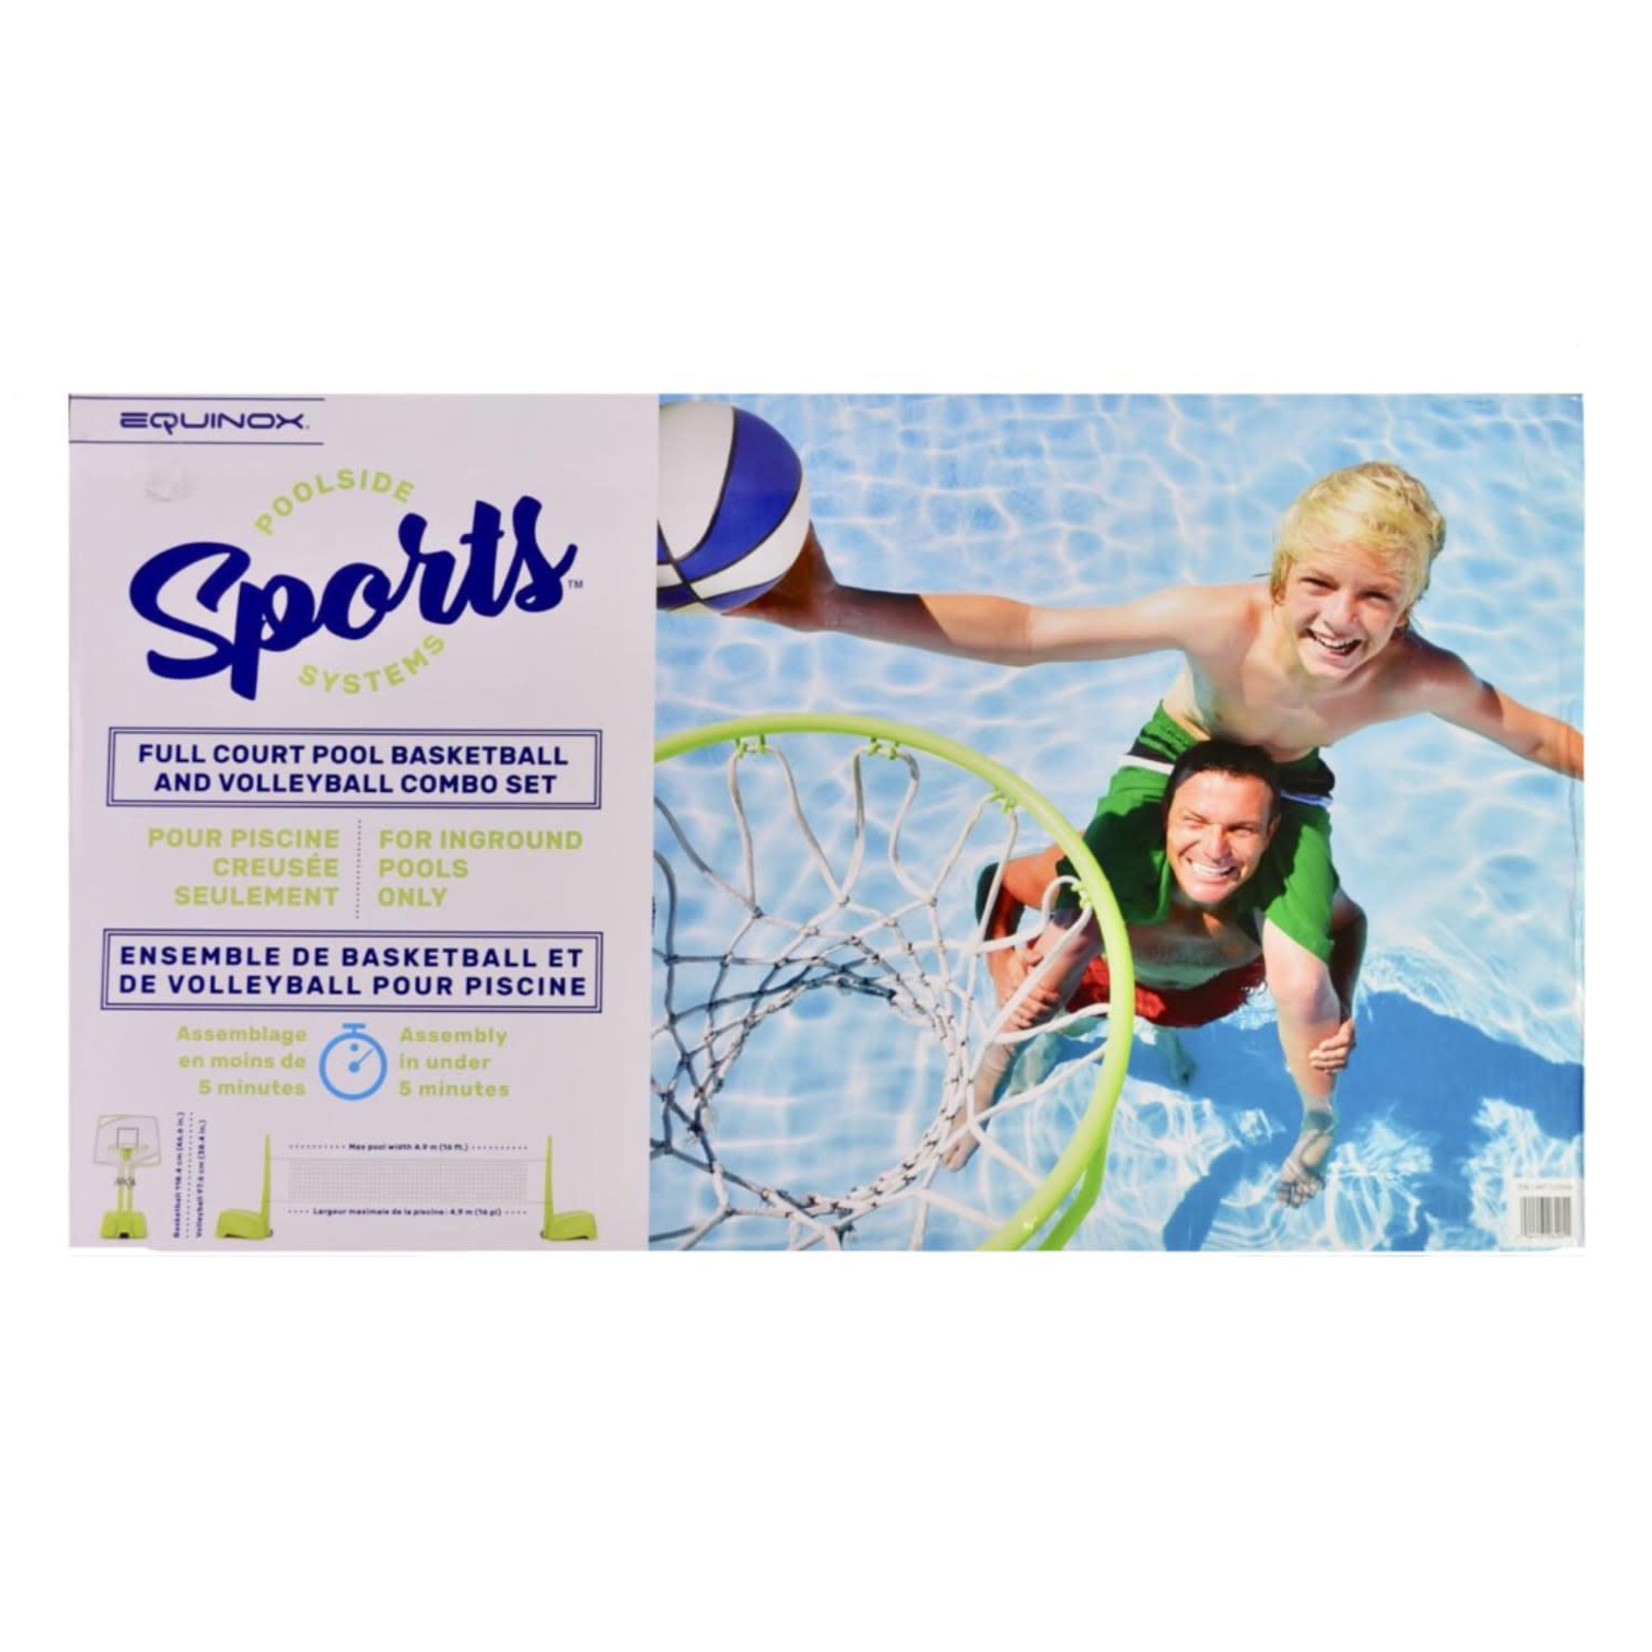 Equinox Poolside Sport Set